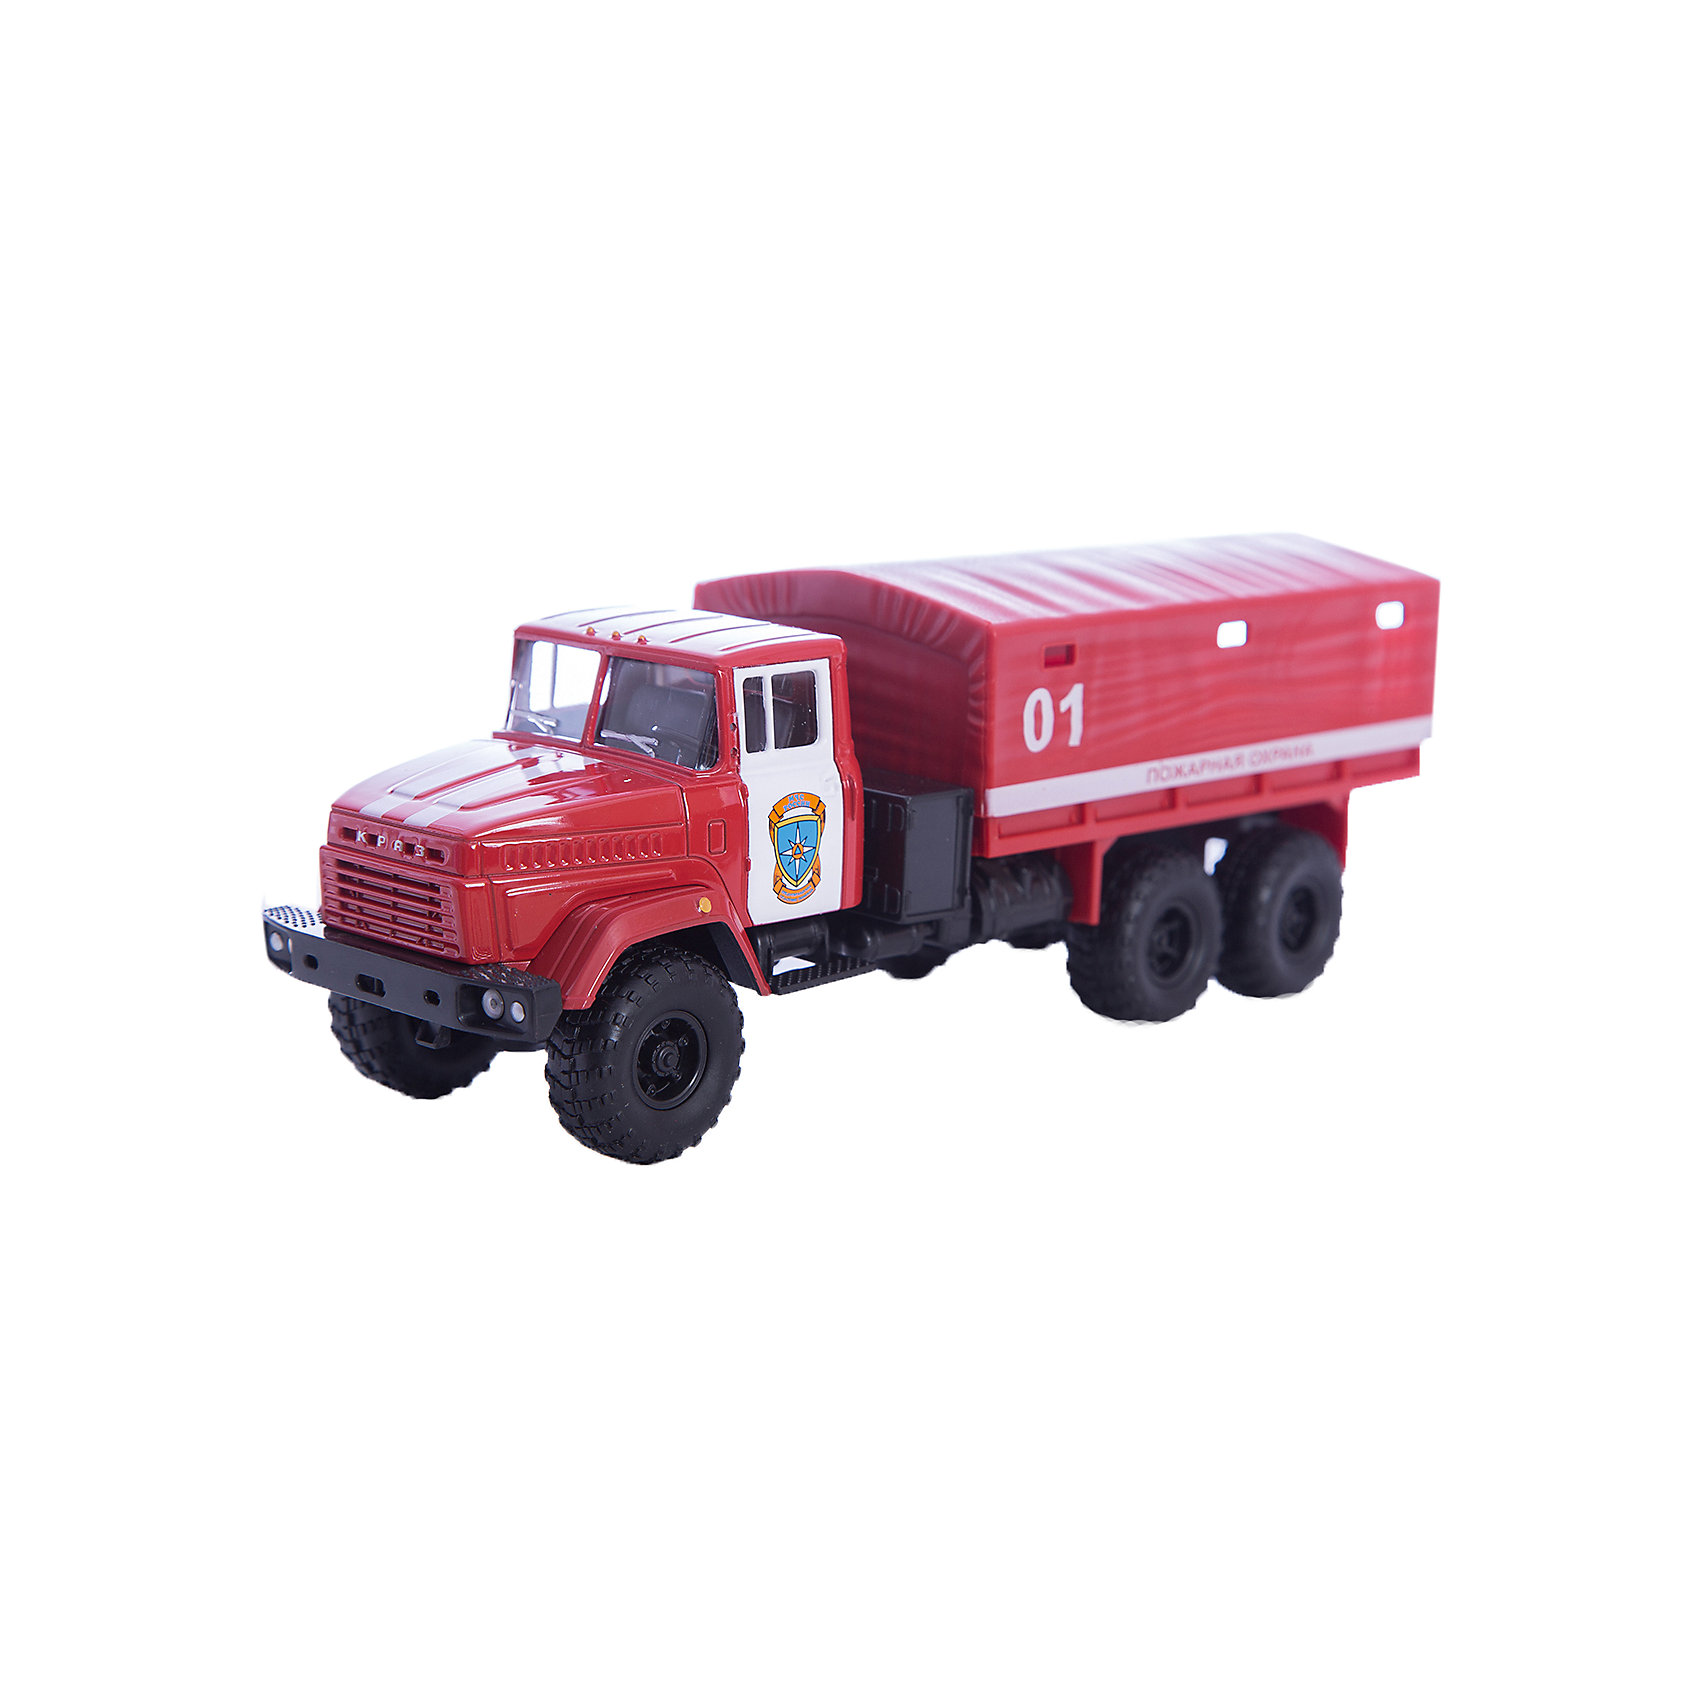 Машинка KRAZ-6322 пожарная охрана, AutotimeМашинки<br><br><br>Ширина мм: 250<br>Глубина мм: 95<br>Высота мм: 110<br>Вес г: 25<br>Возраст от месяцев: 36<br>Возраст до месяцев: 2147483647<br>Пол: Мужской<br>Возраст: Детский<br>SKU: 5584000